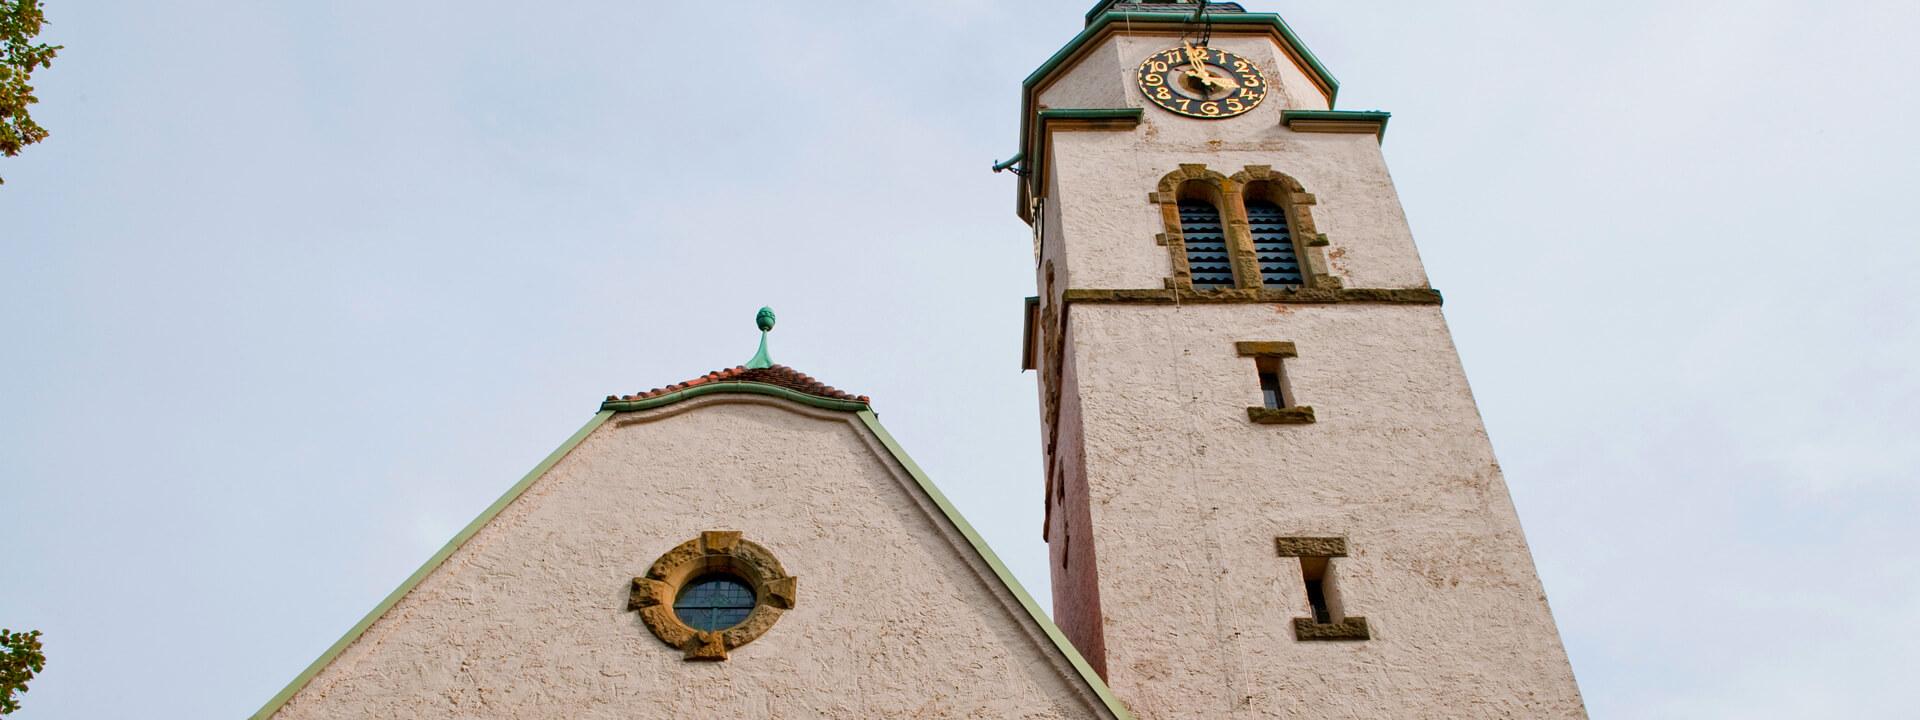 header-jugendstilkirche.jpg